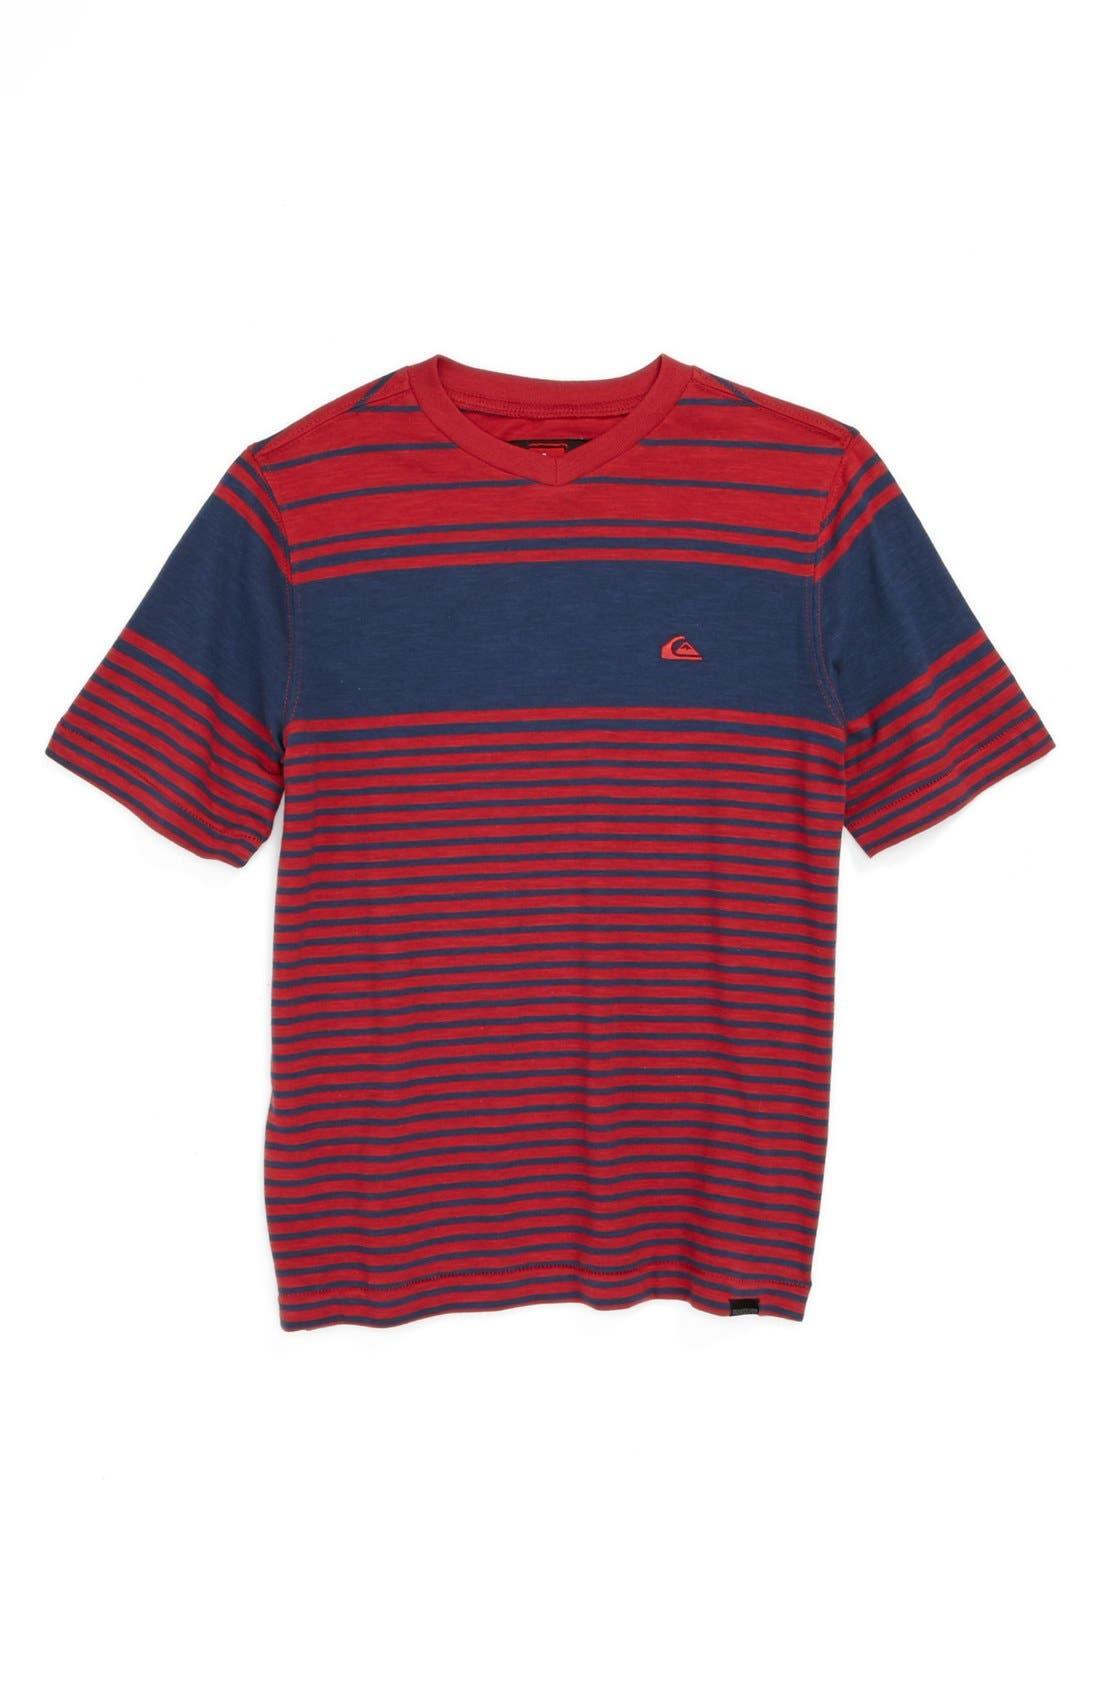 Alternate Image 1 Selected - Quiksilver 'Vert Shoe By' T-Shirt (Little Boys & Big Boys)